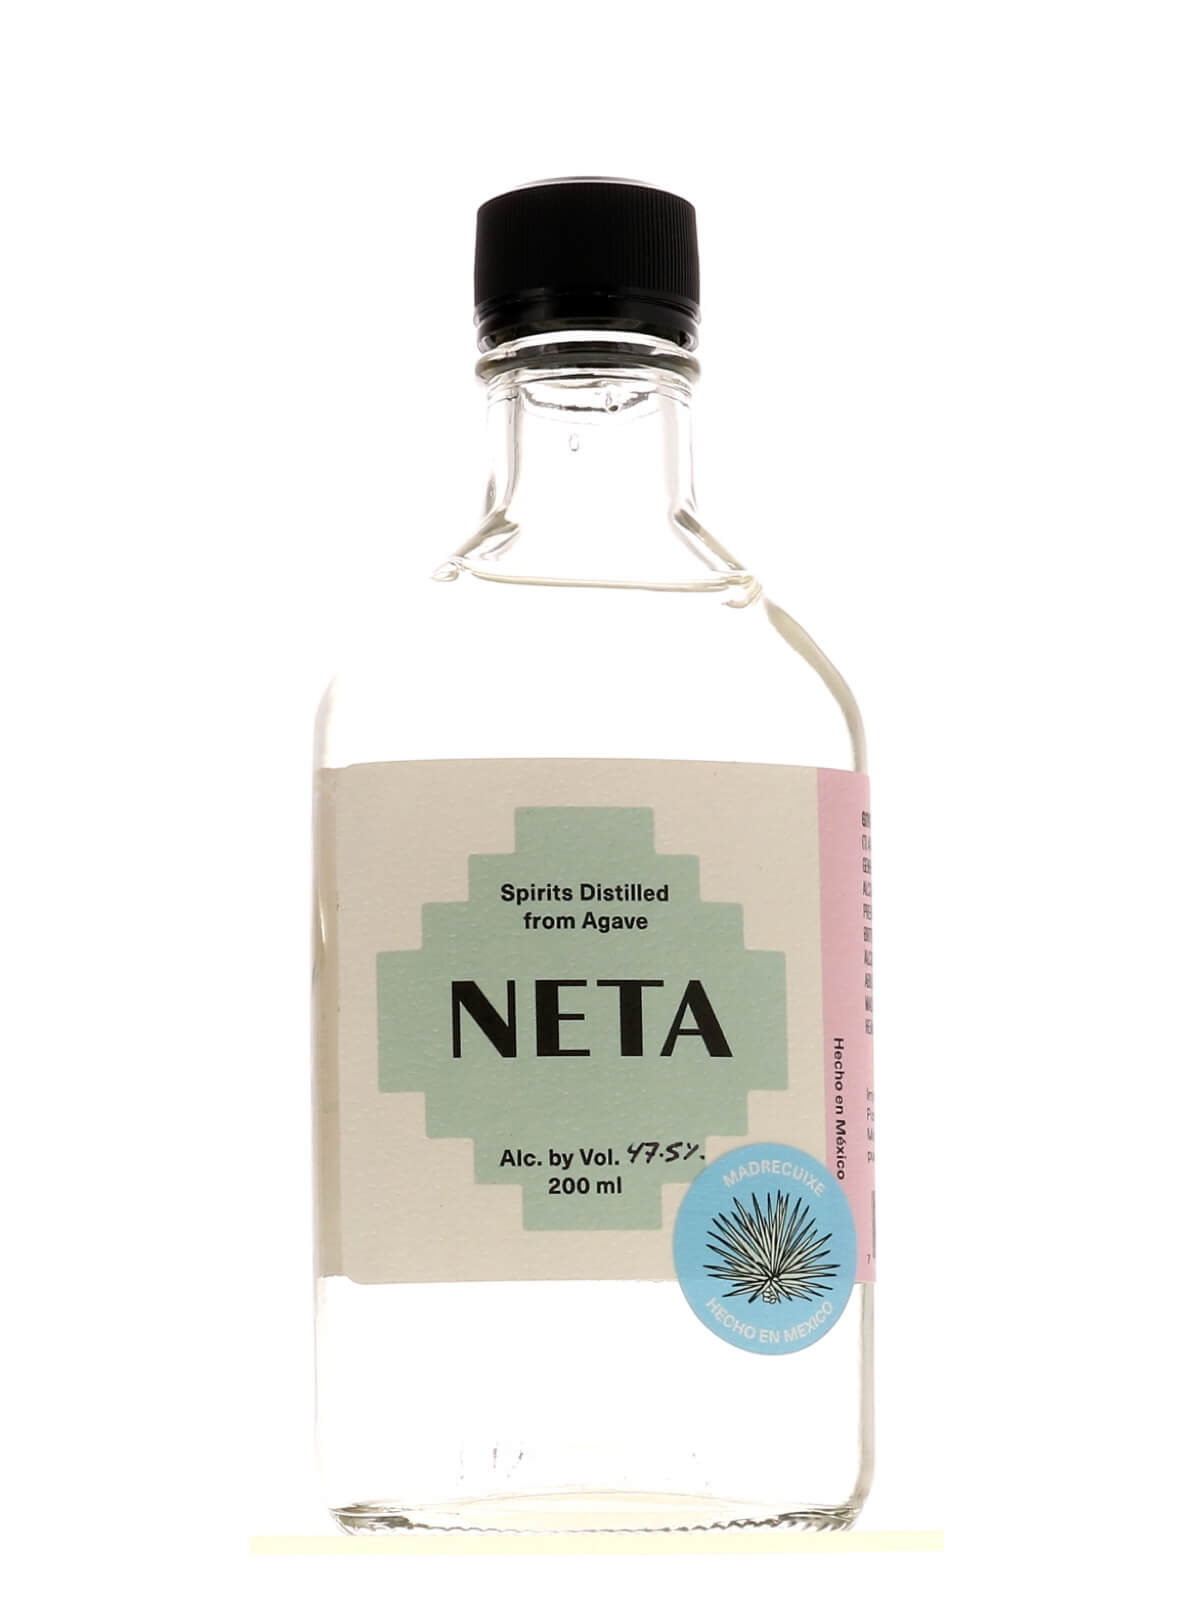 Neta Madrecuixe 200ml bottle from Agave Mixtape